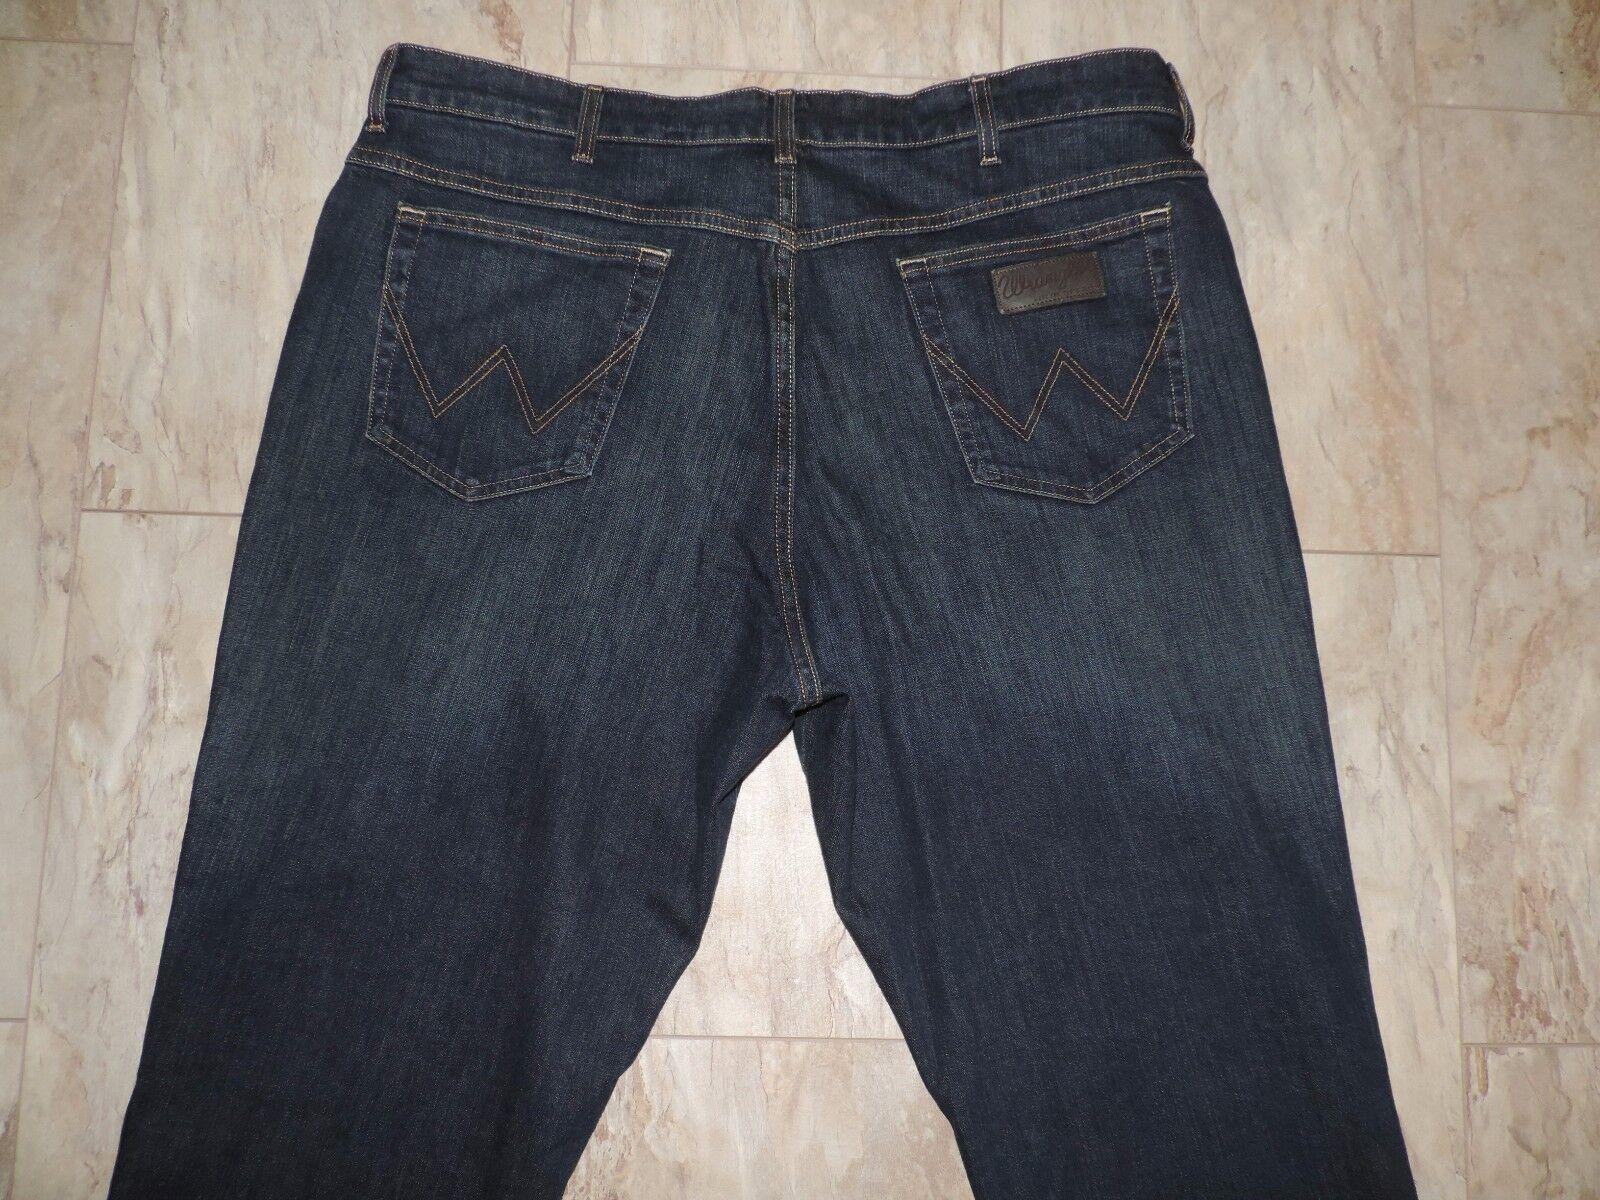 Wrangler Texas Herren Jeans  Gr. W42 L32 neu